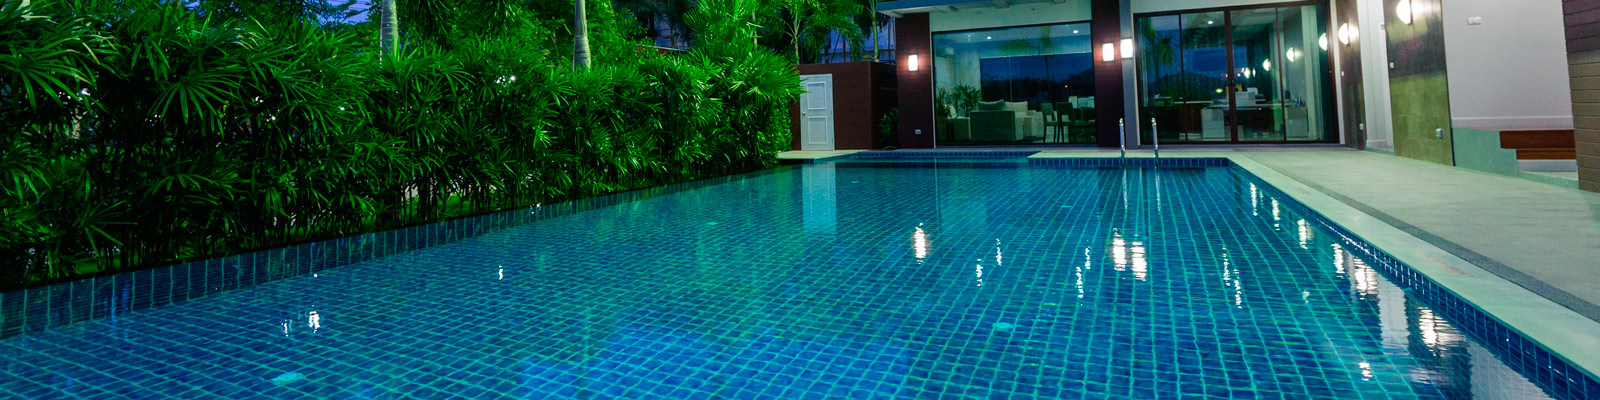 Mantenimiento de piscinas en madrid climatizacion de for Depuradoras de piscinas